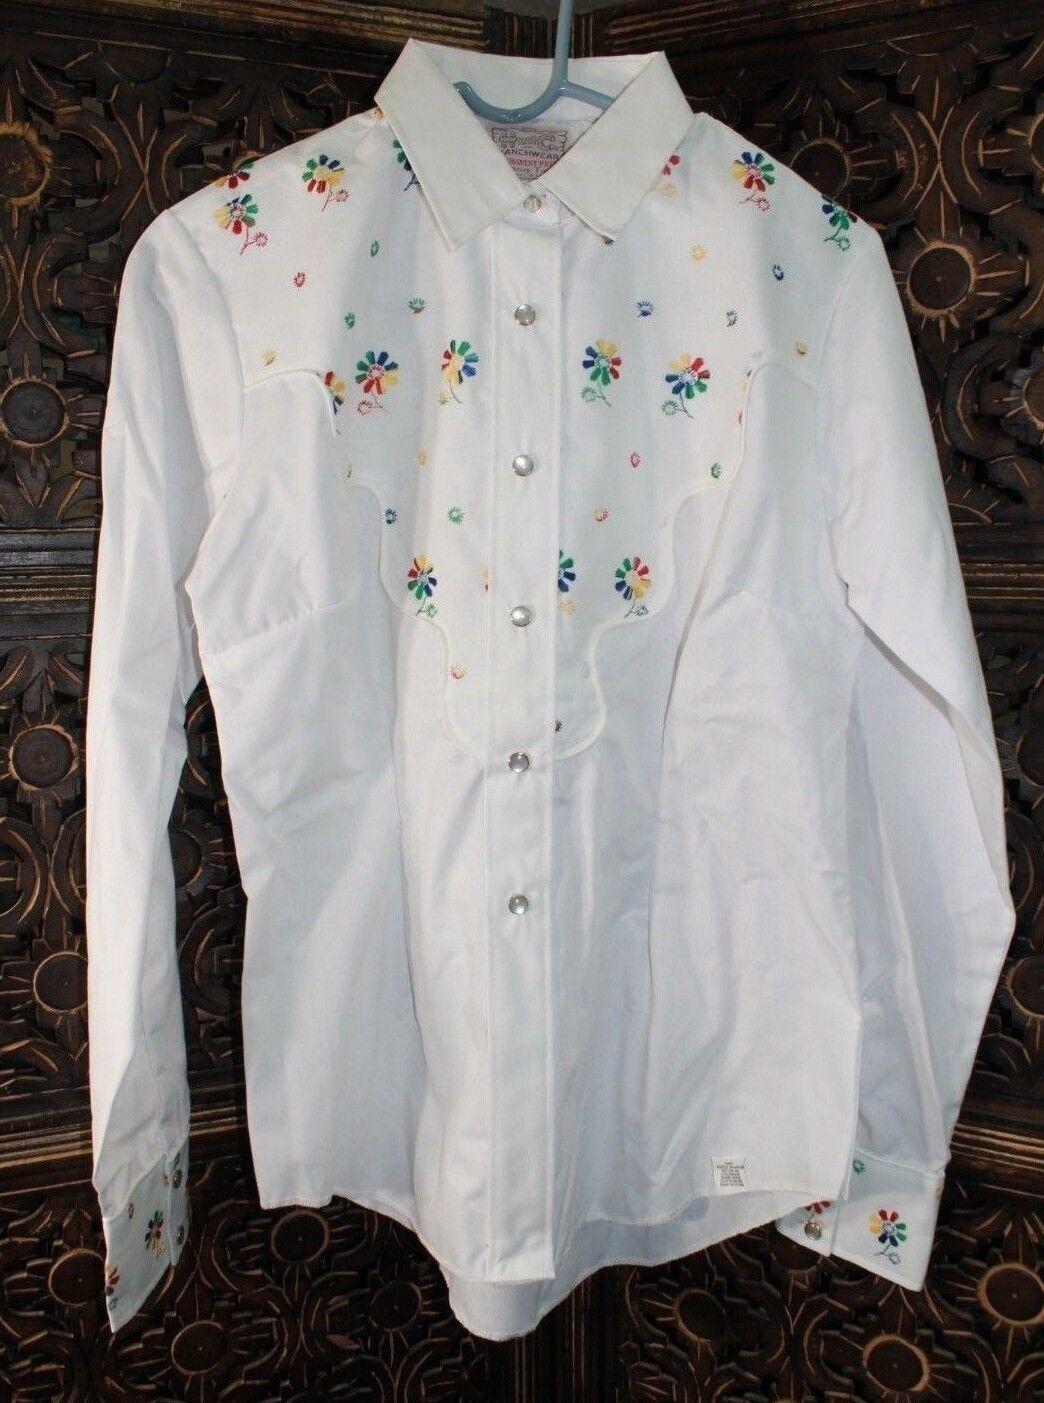 H BAR C Ranchwear damen Western Snap Up Long Sleeve Shirt Größe  36